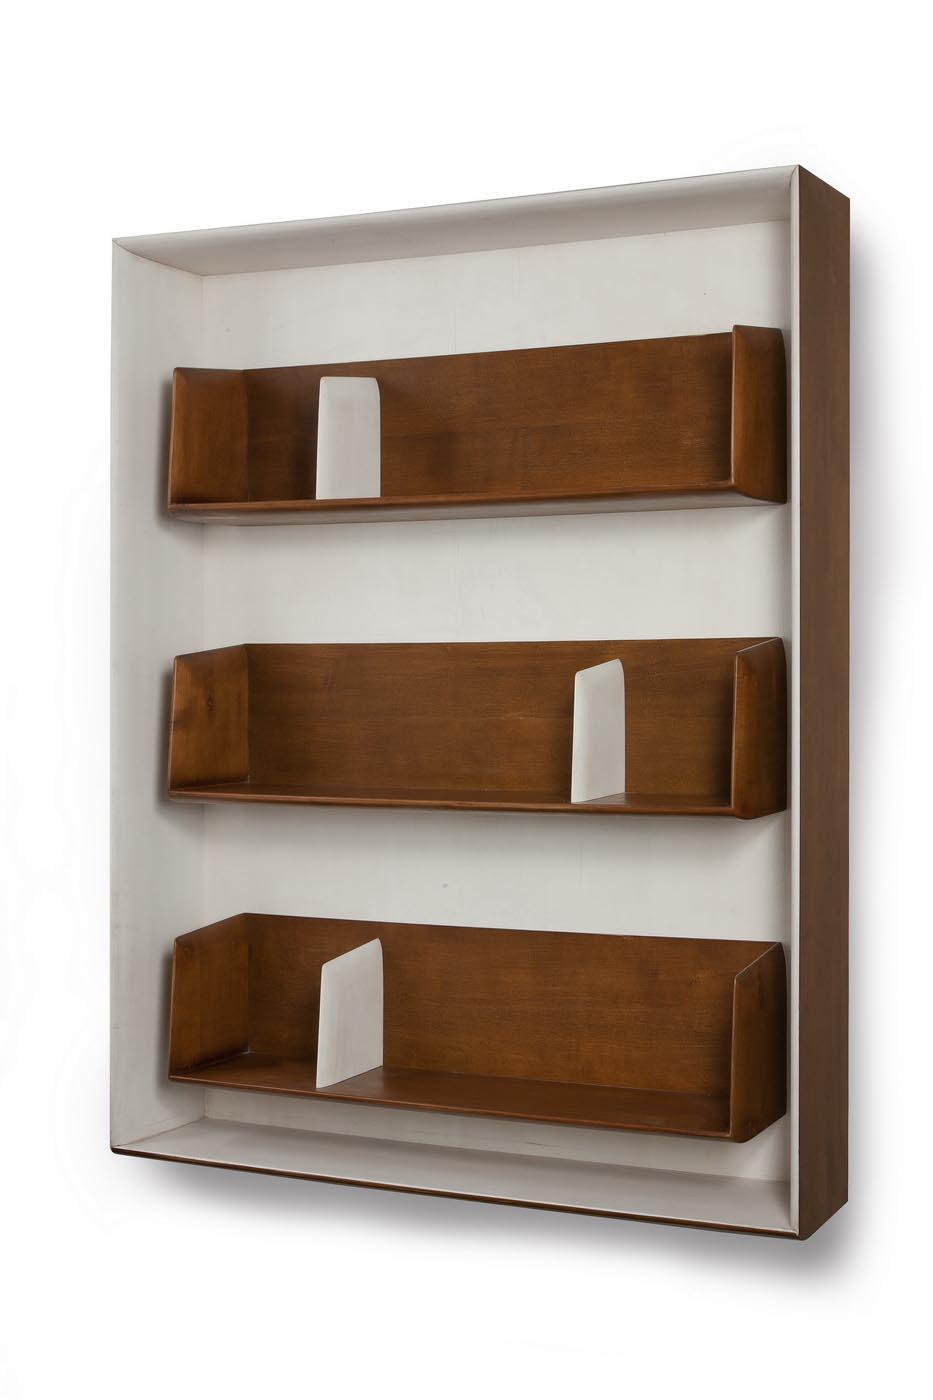 Unique Wood Wall Shelves